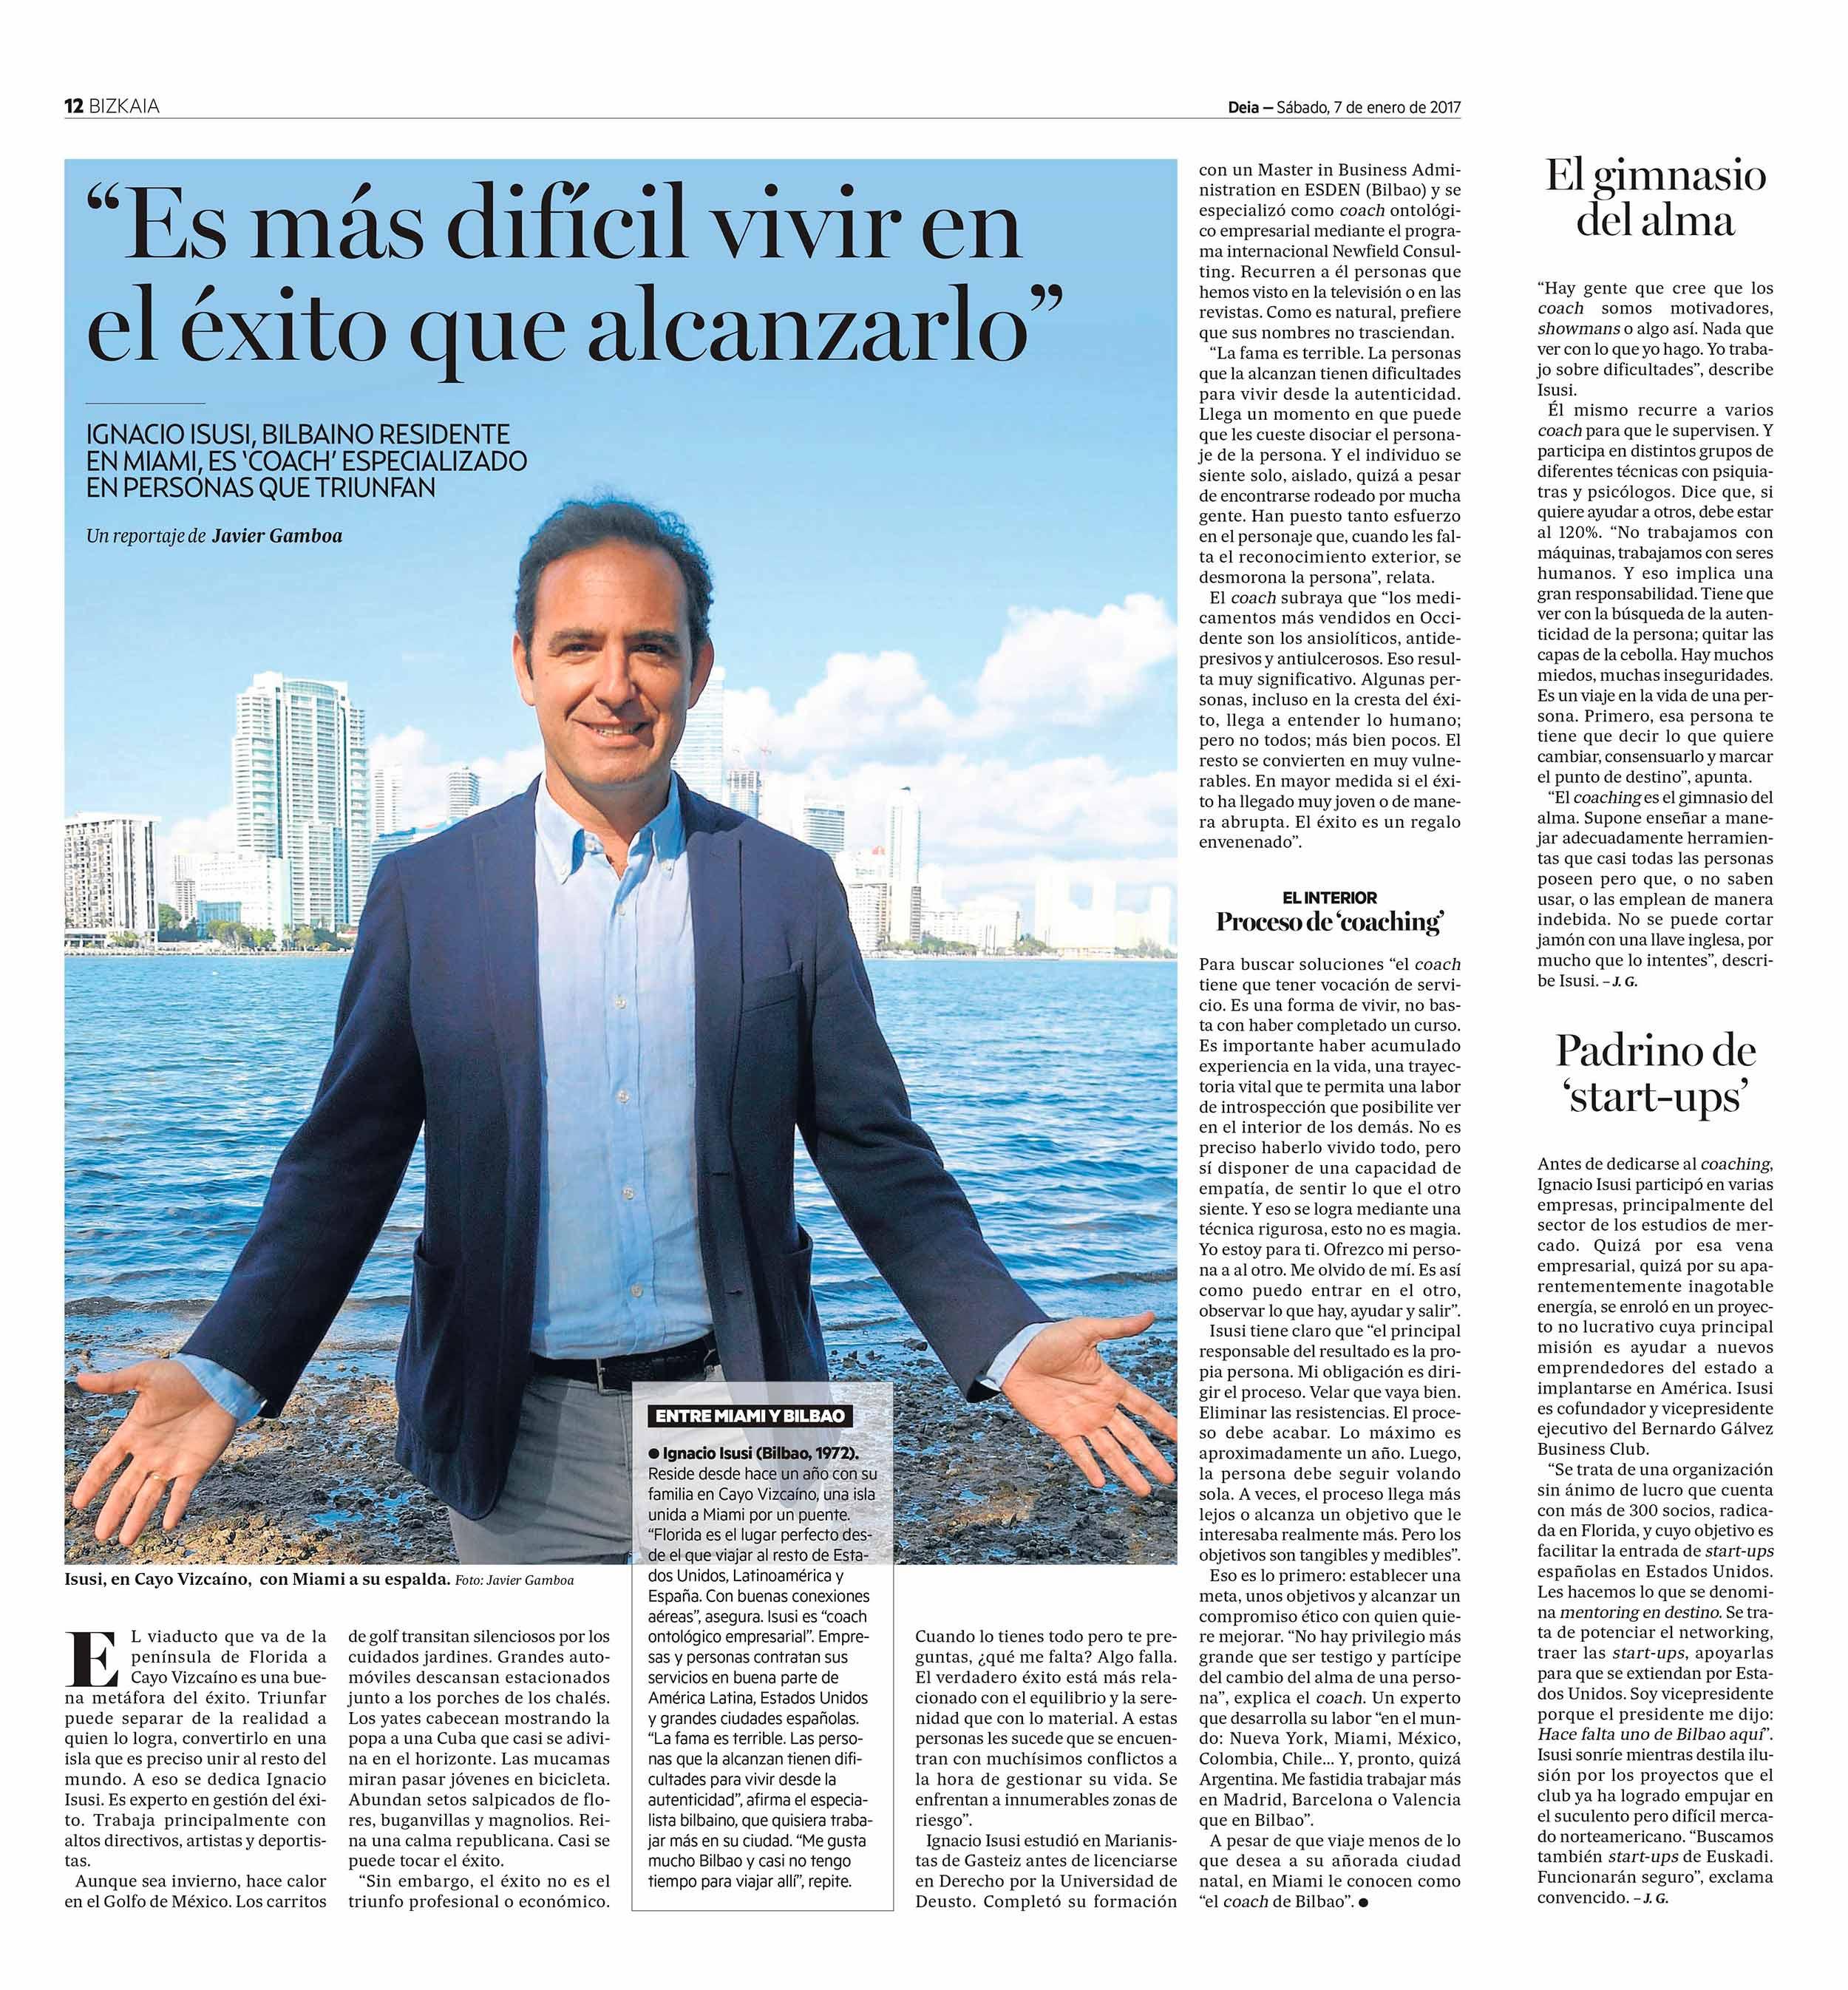 Ignacio Isusi - Éxito